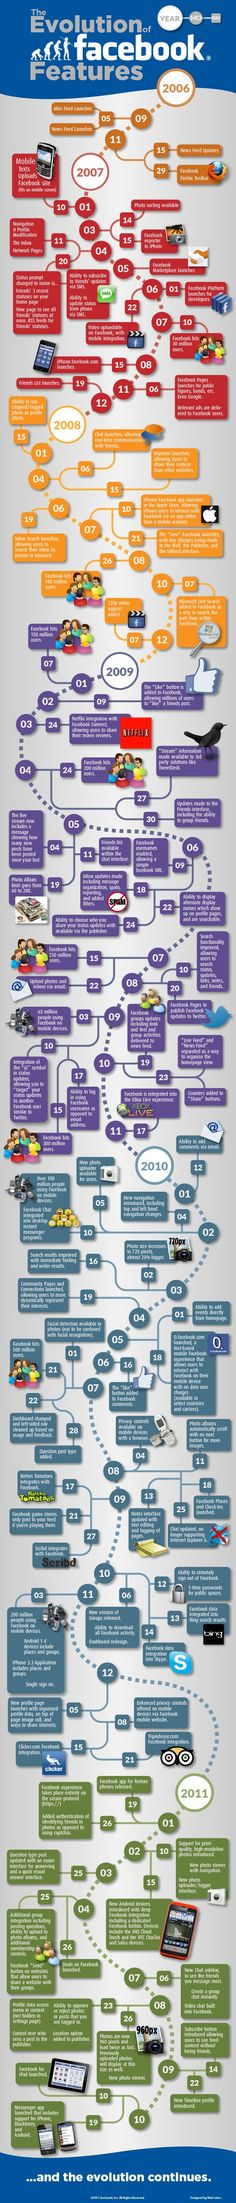 The evolution of Facebook